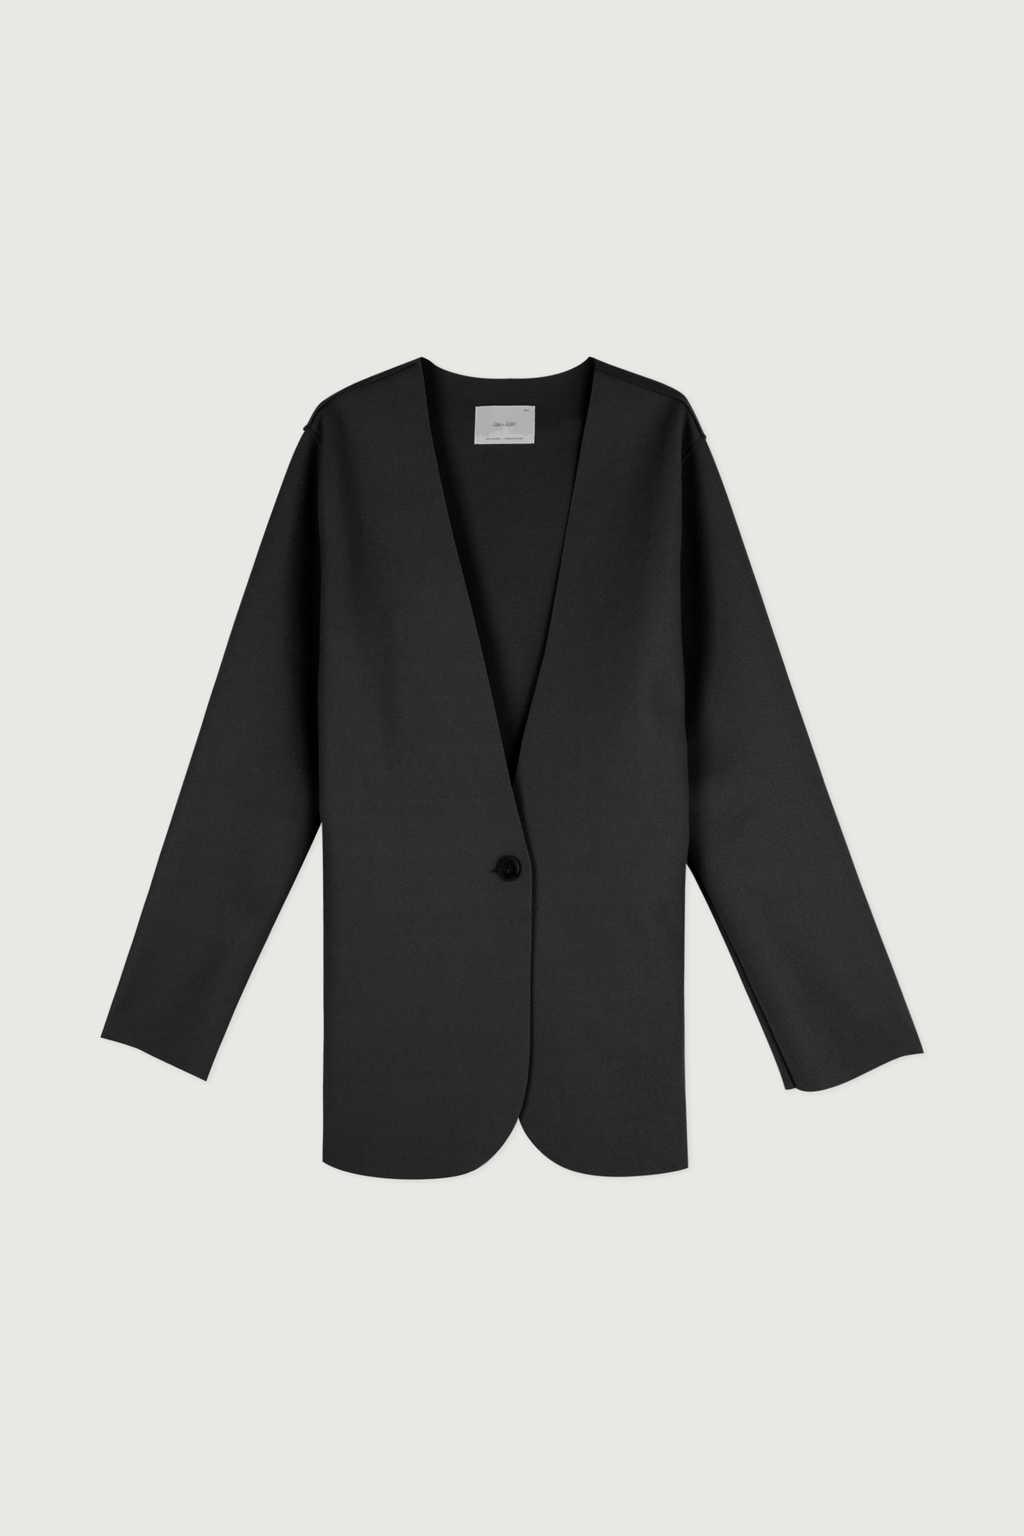 Jacket J009 Black 9